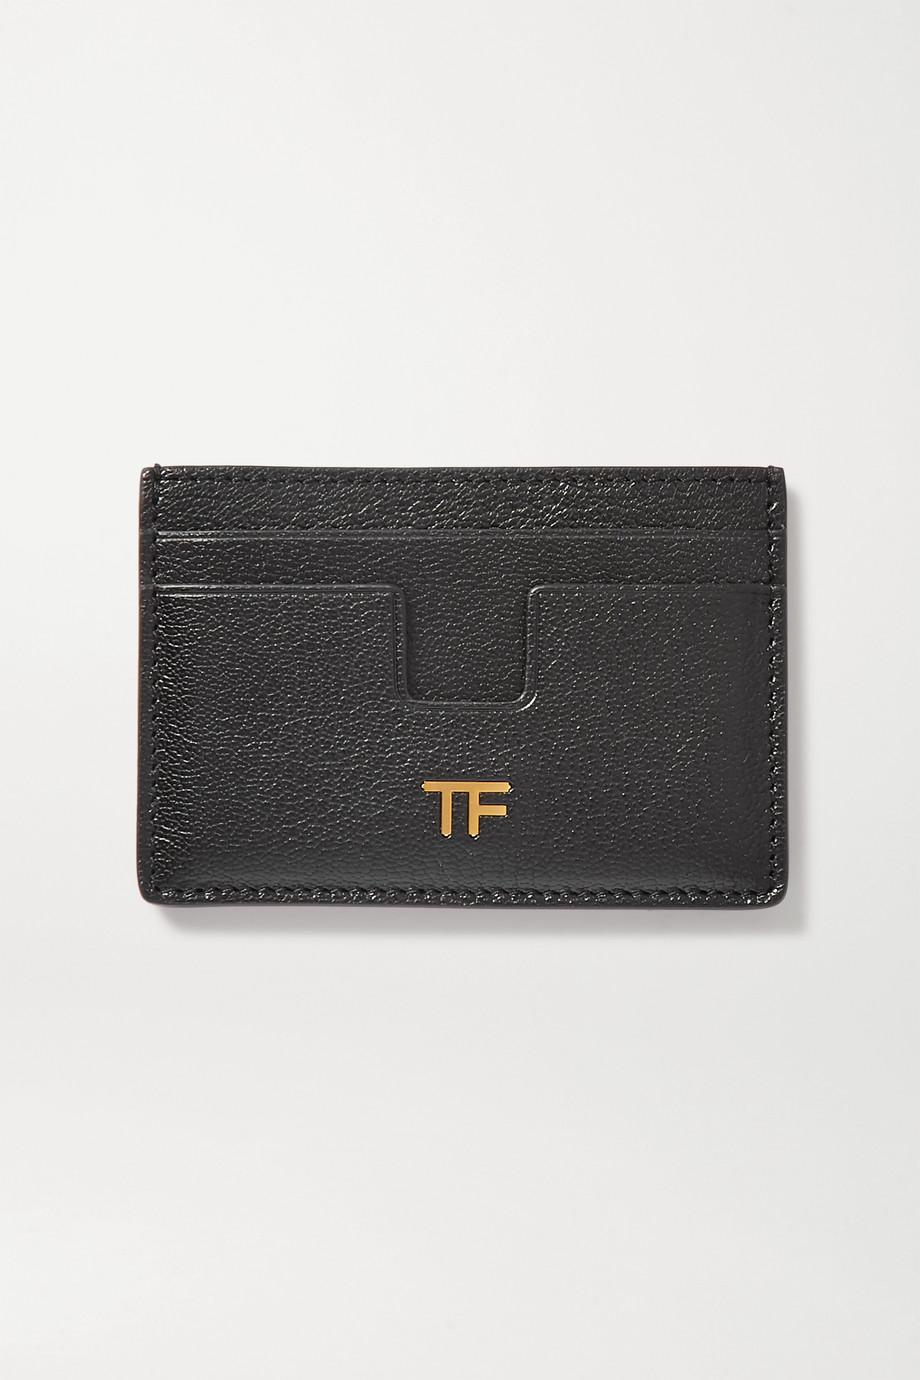 TOM FORD Porte-cartes en cuir